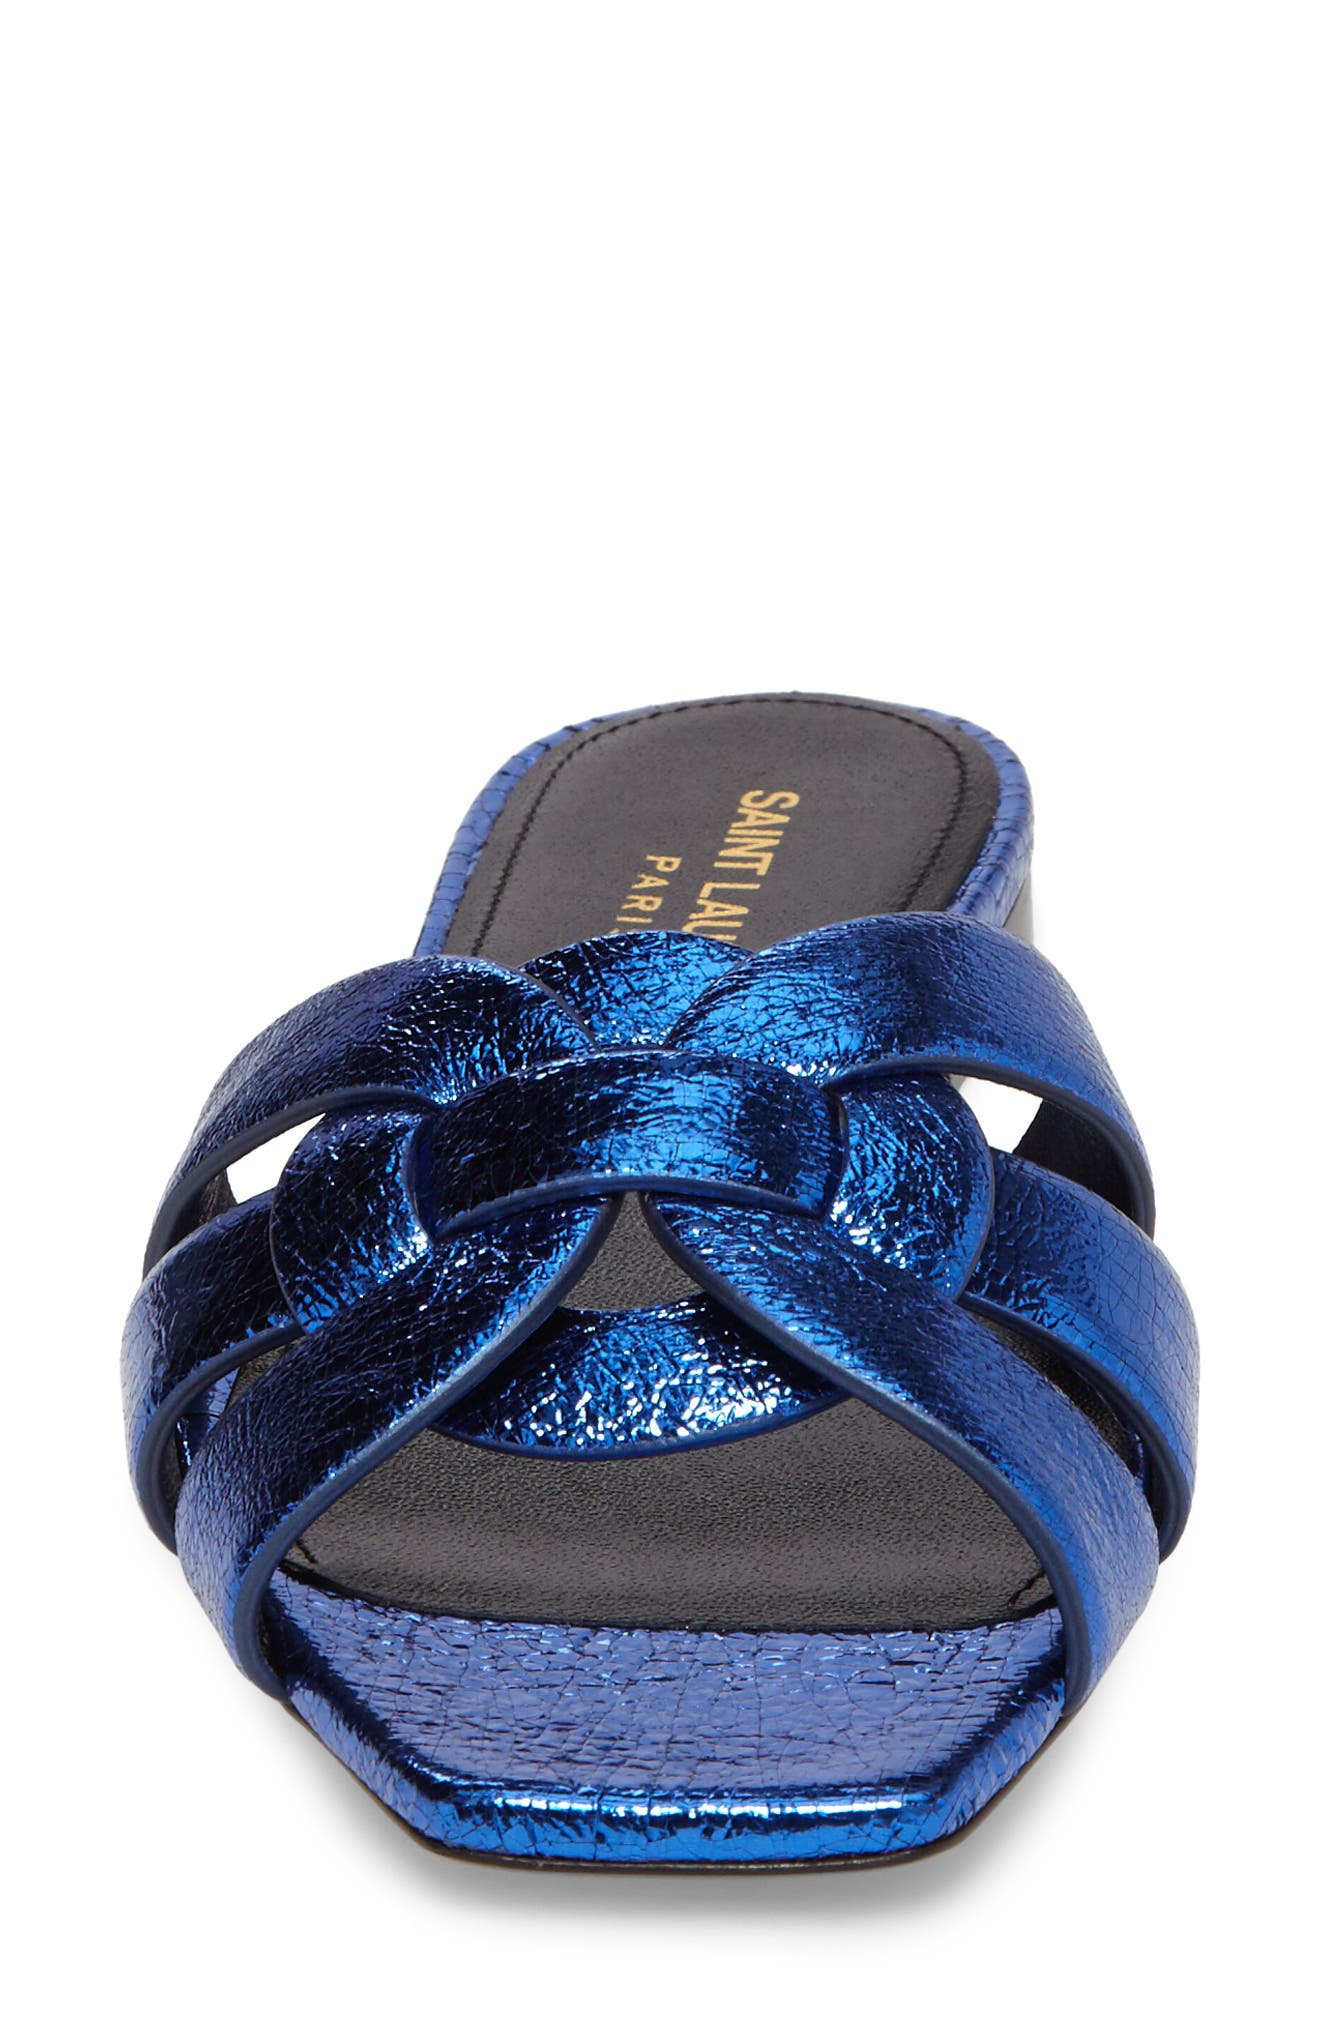 Pieds Metallic Slide Sandal,                             Alternate thumbnail 4, color,                             450